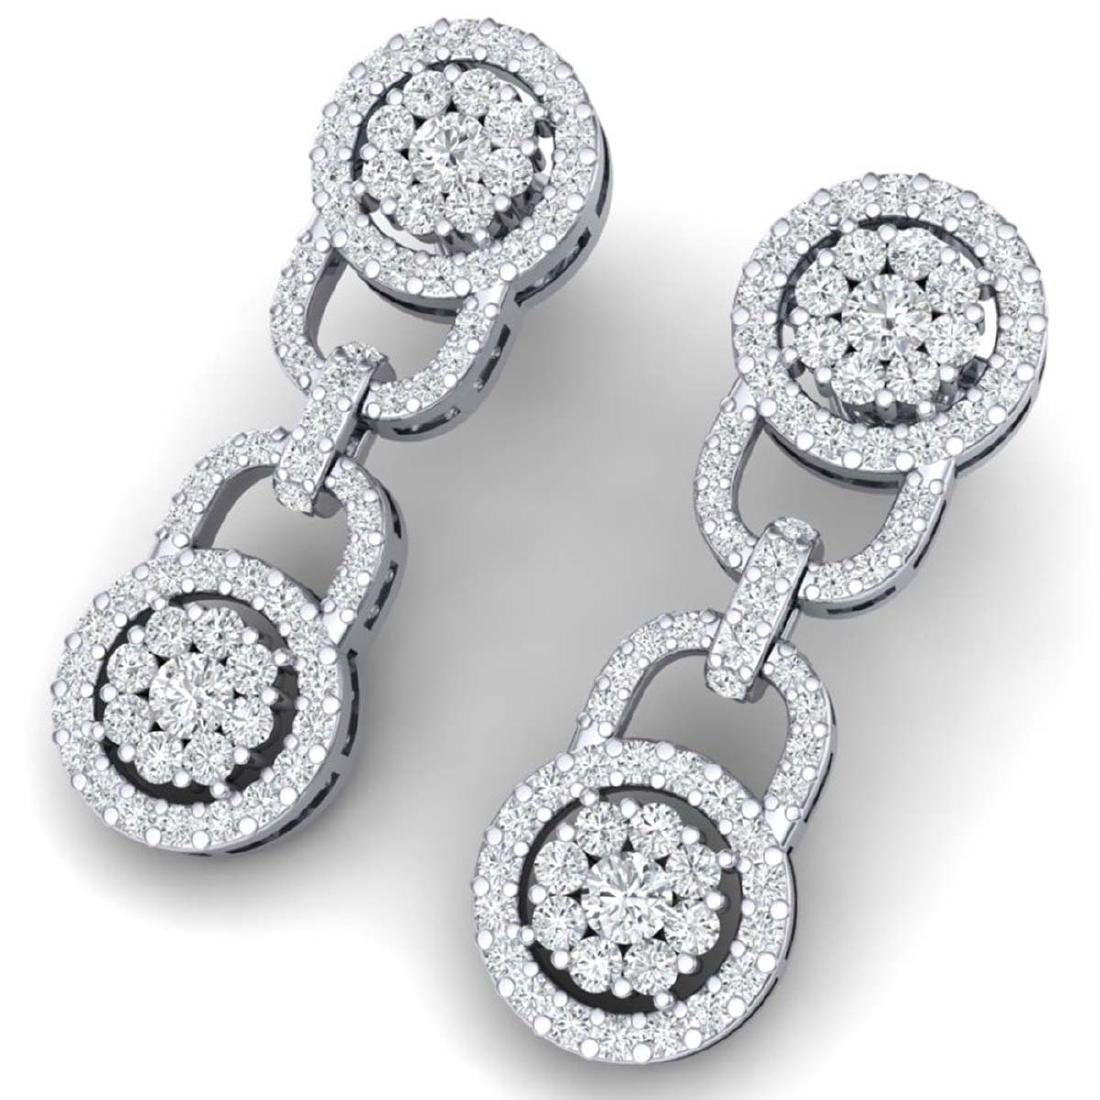 2.30 CTW Certified SI/I Diamond Halo Earrings 18K White